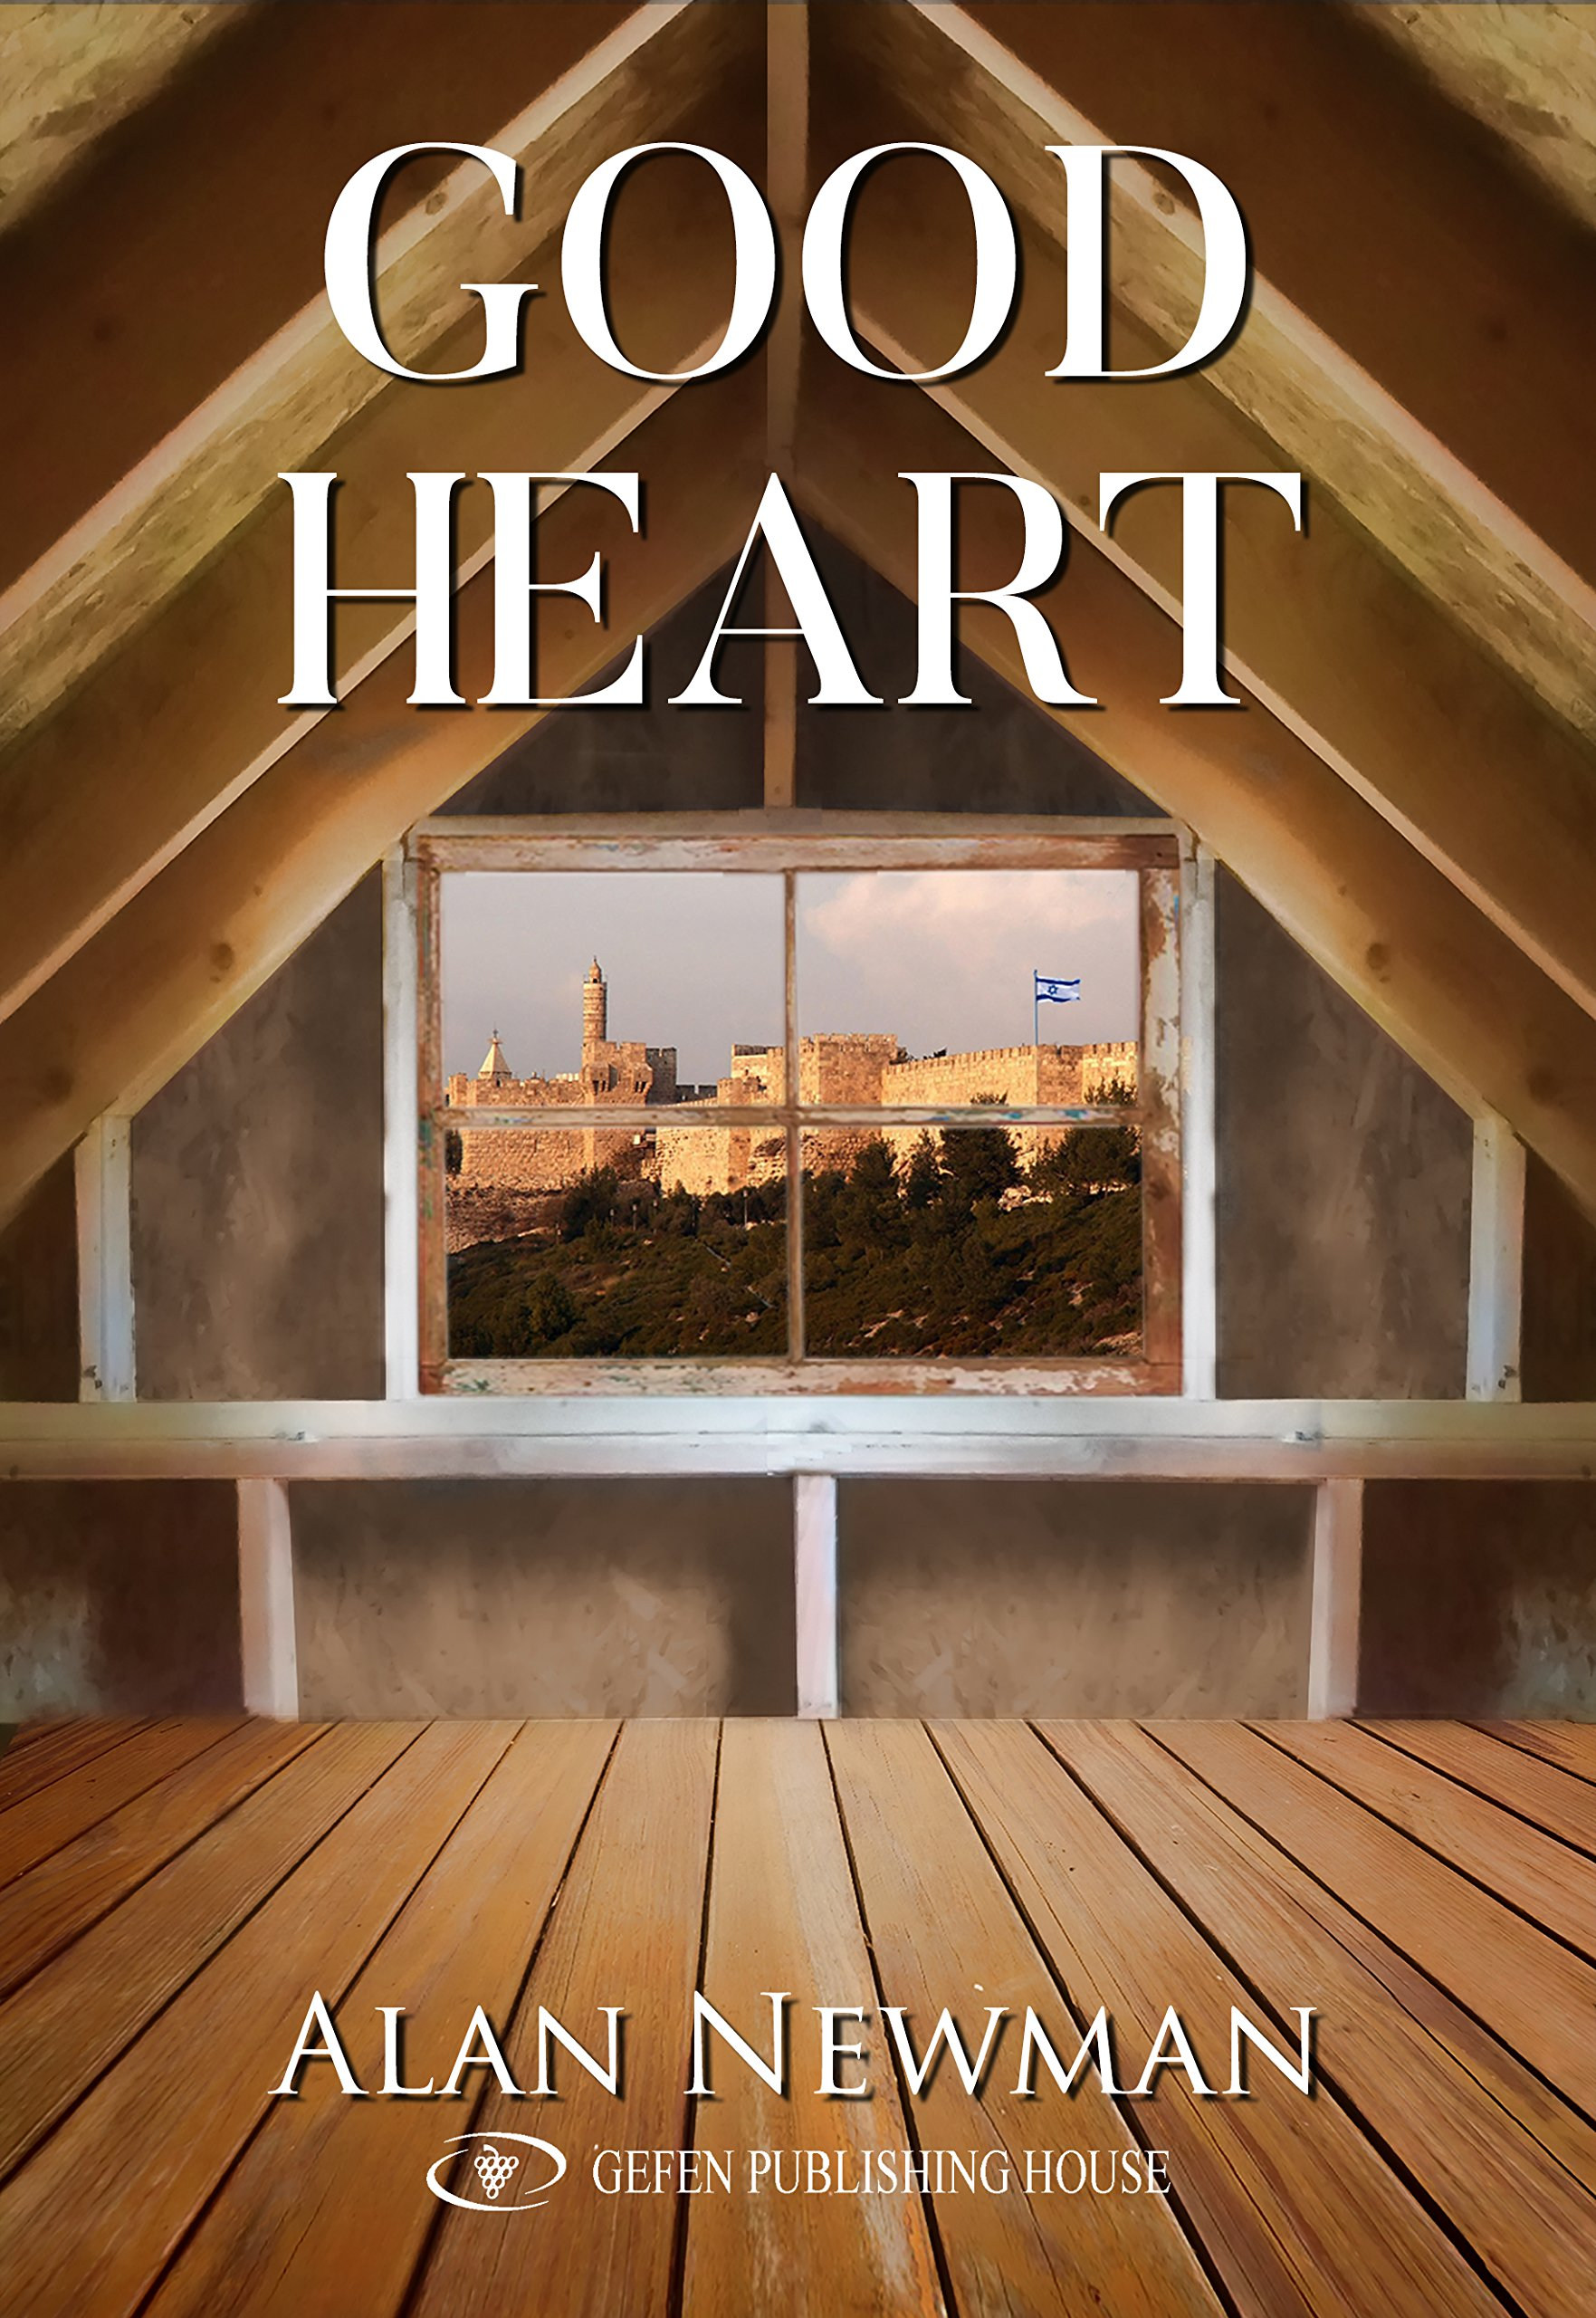 Good Heart: Alan Newman: 9789652299550: Amazon.com: Books